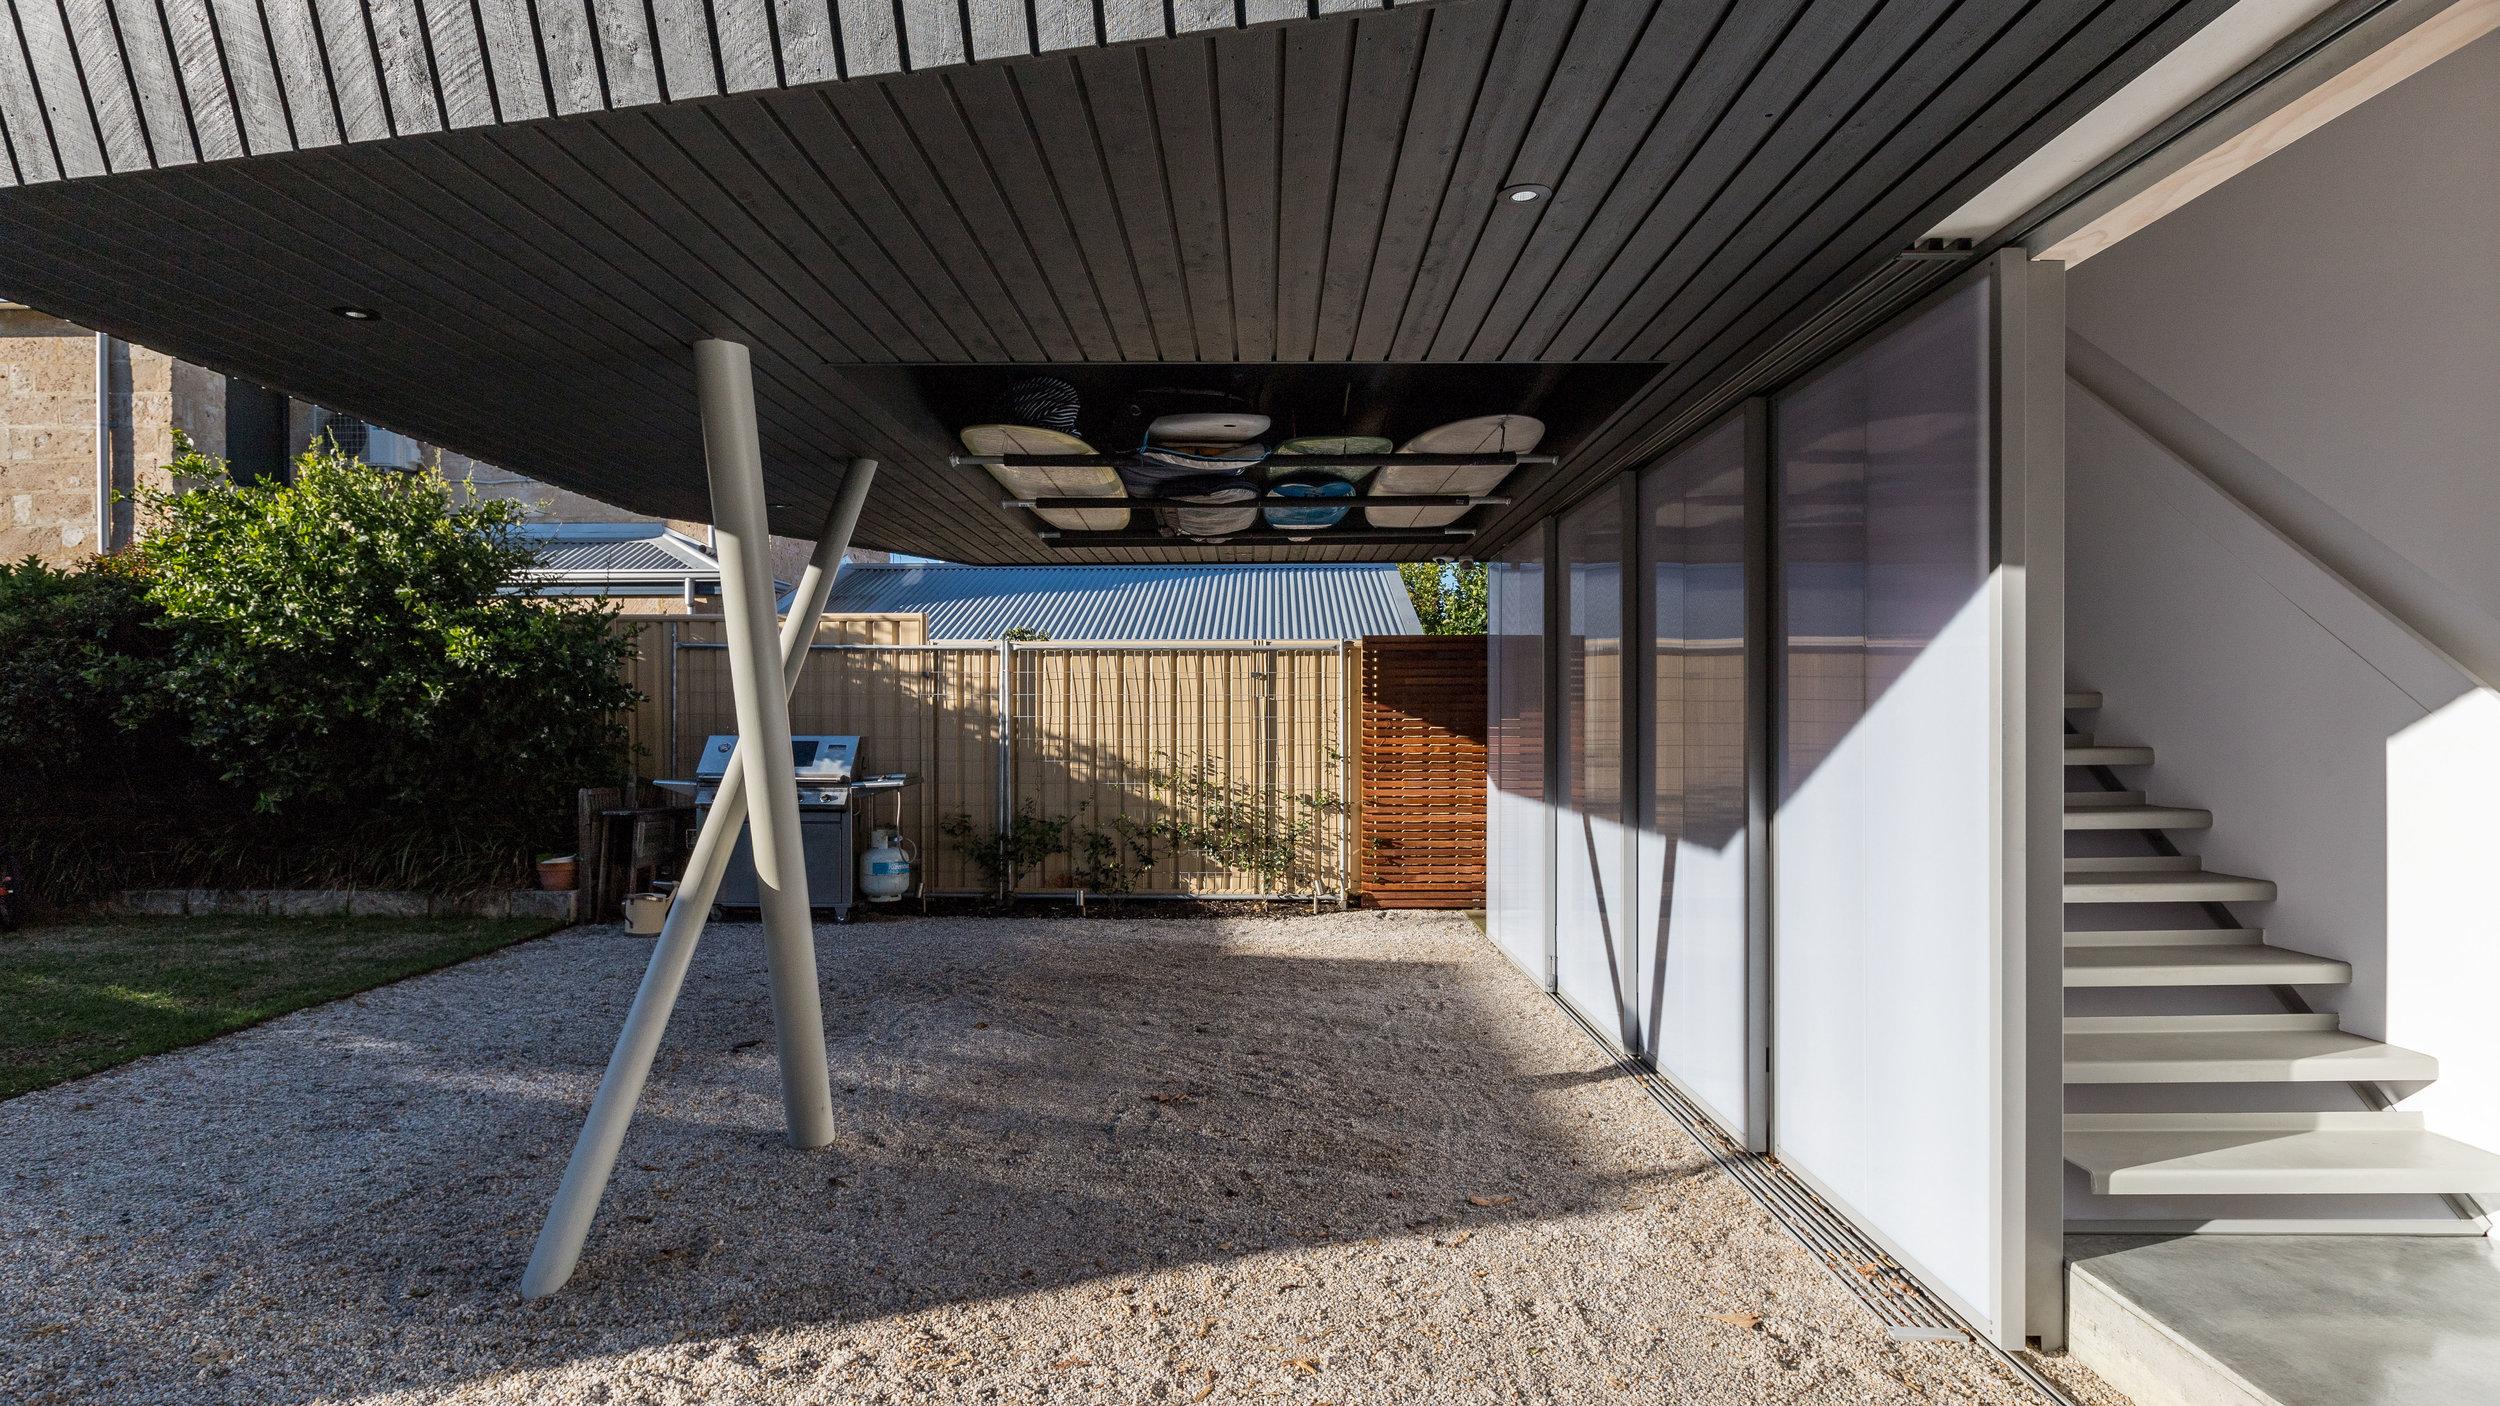 3476-small_Beach Office_Braham Architects_Nicholas Putrasia_06.jpg